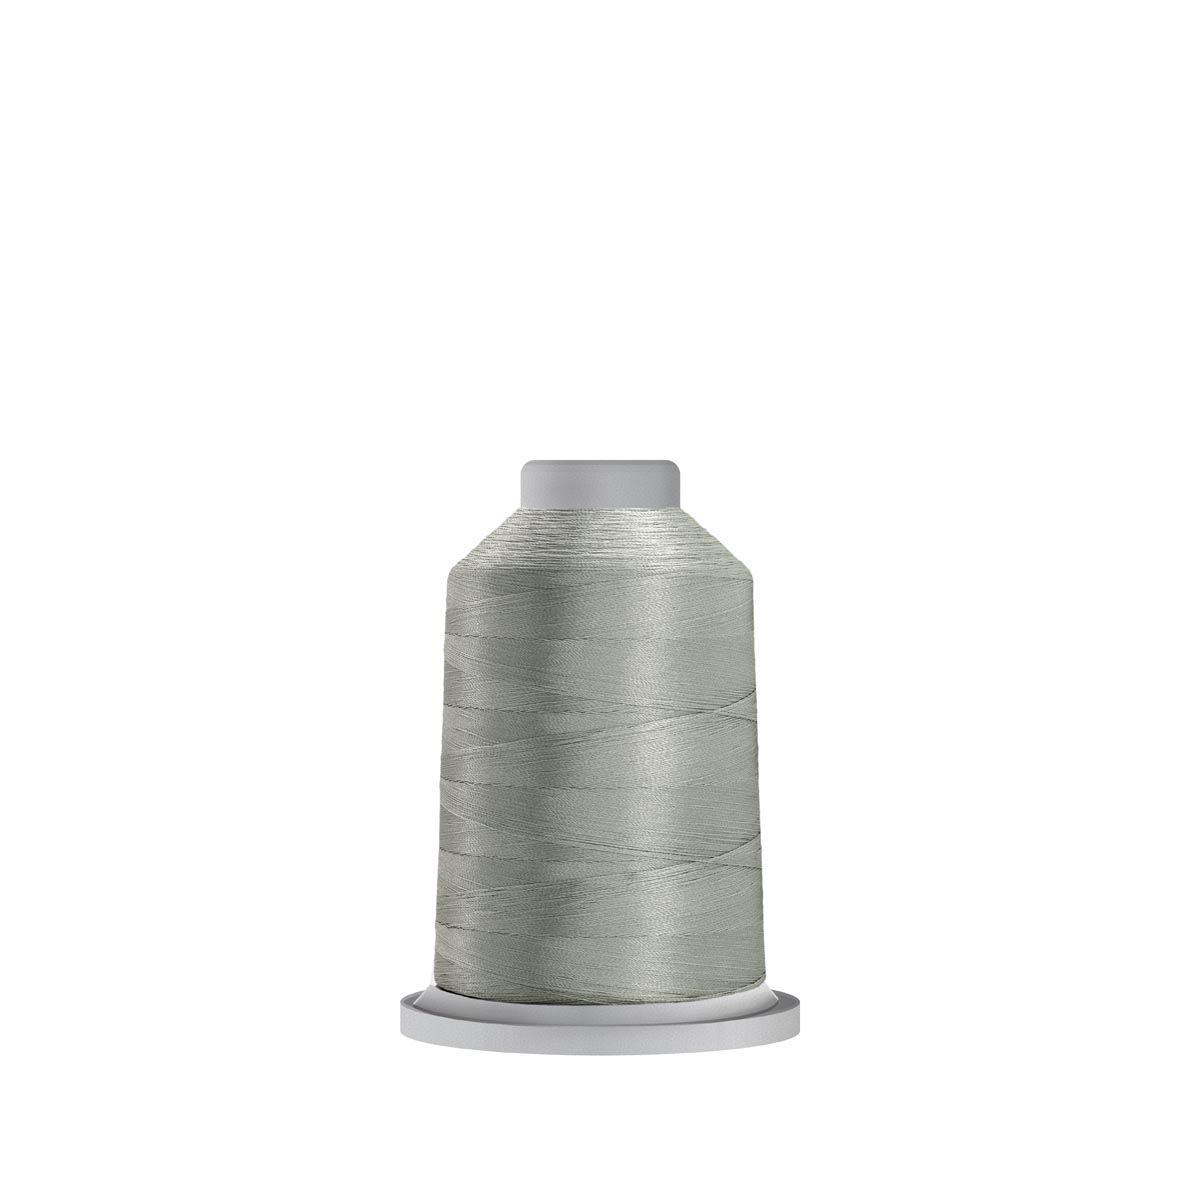 Glide Trilobal Polyester No. 40 Thread - Mercury